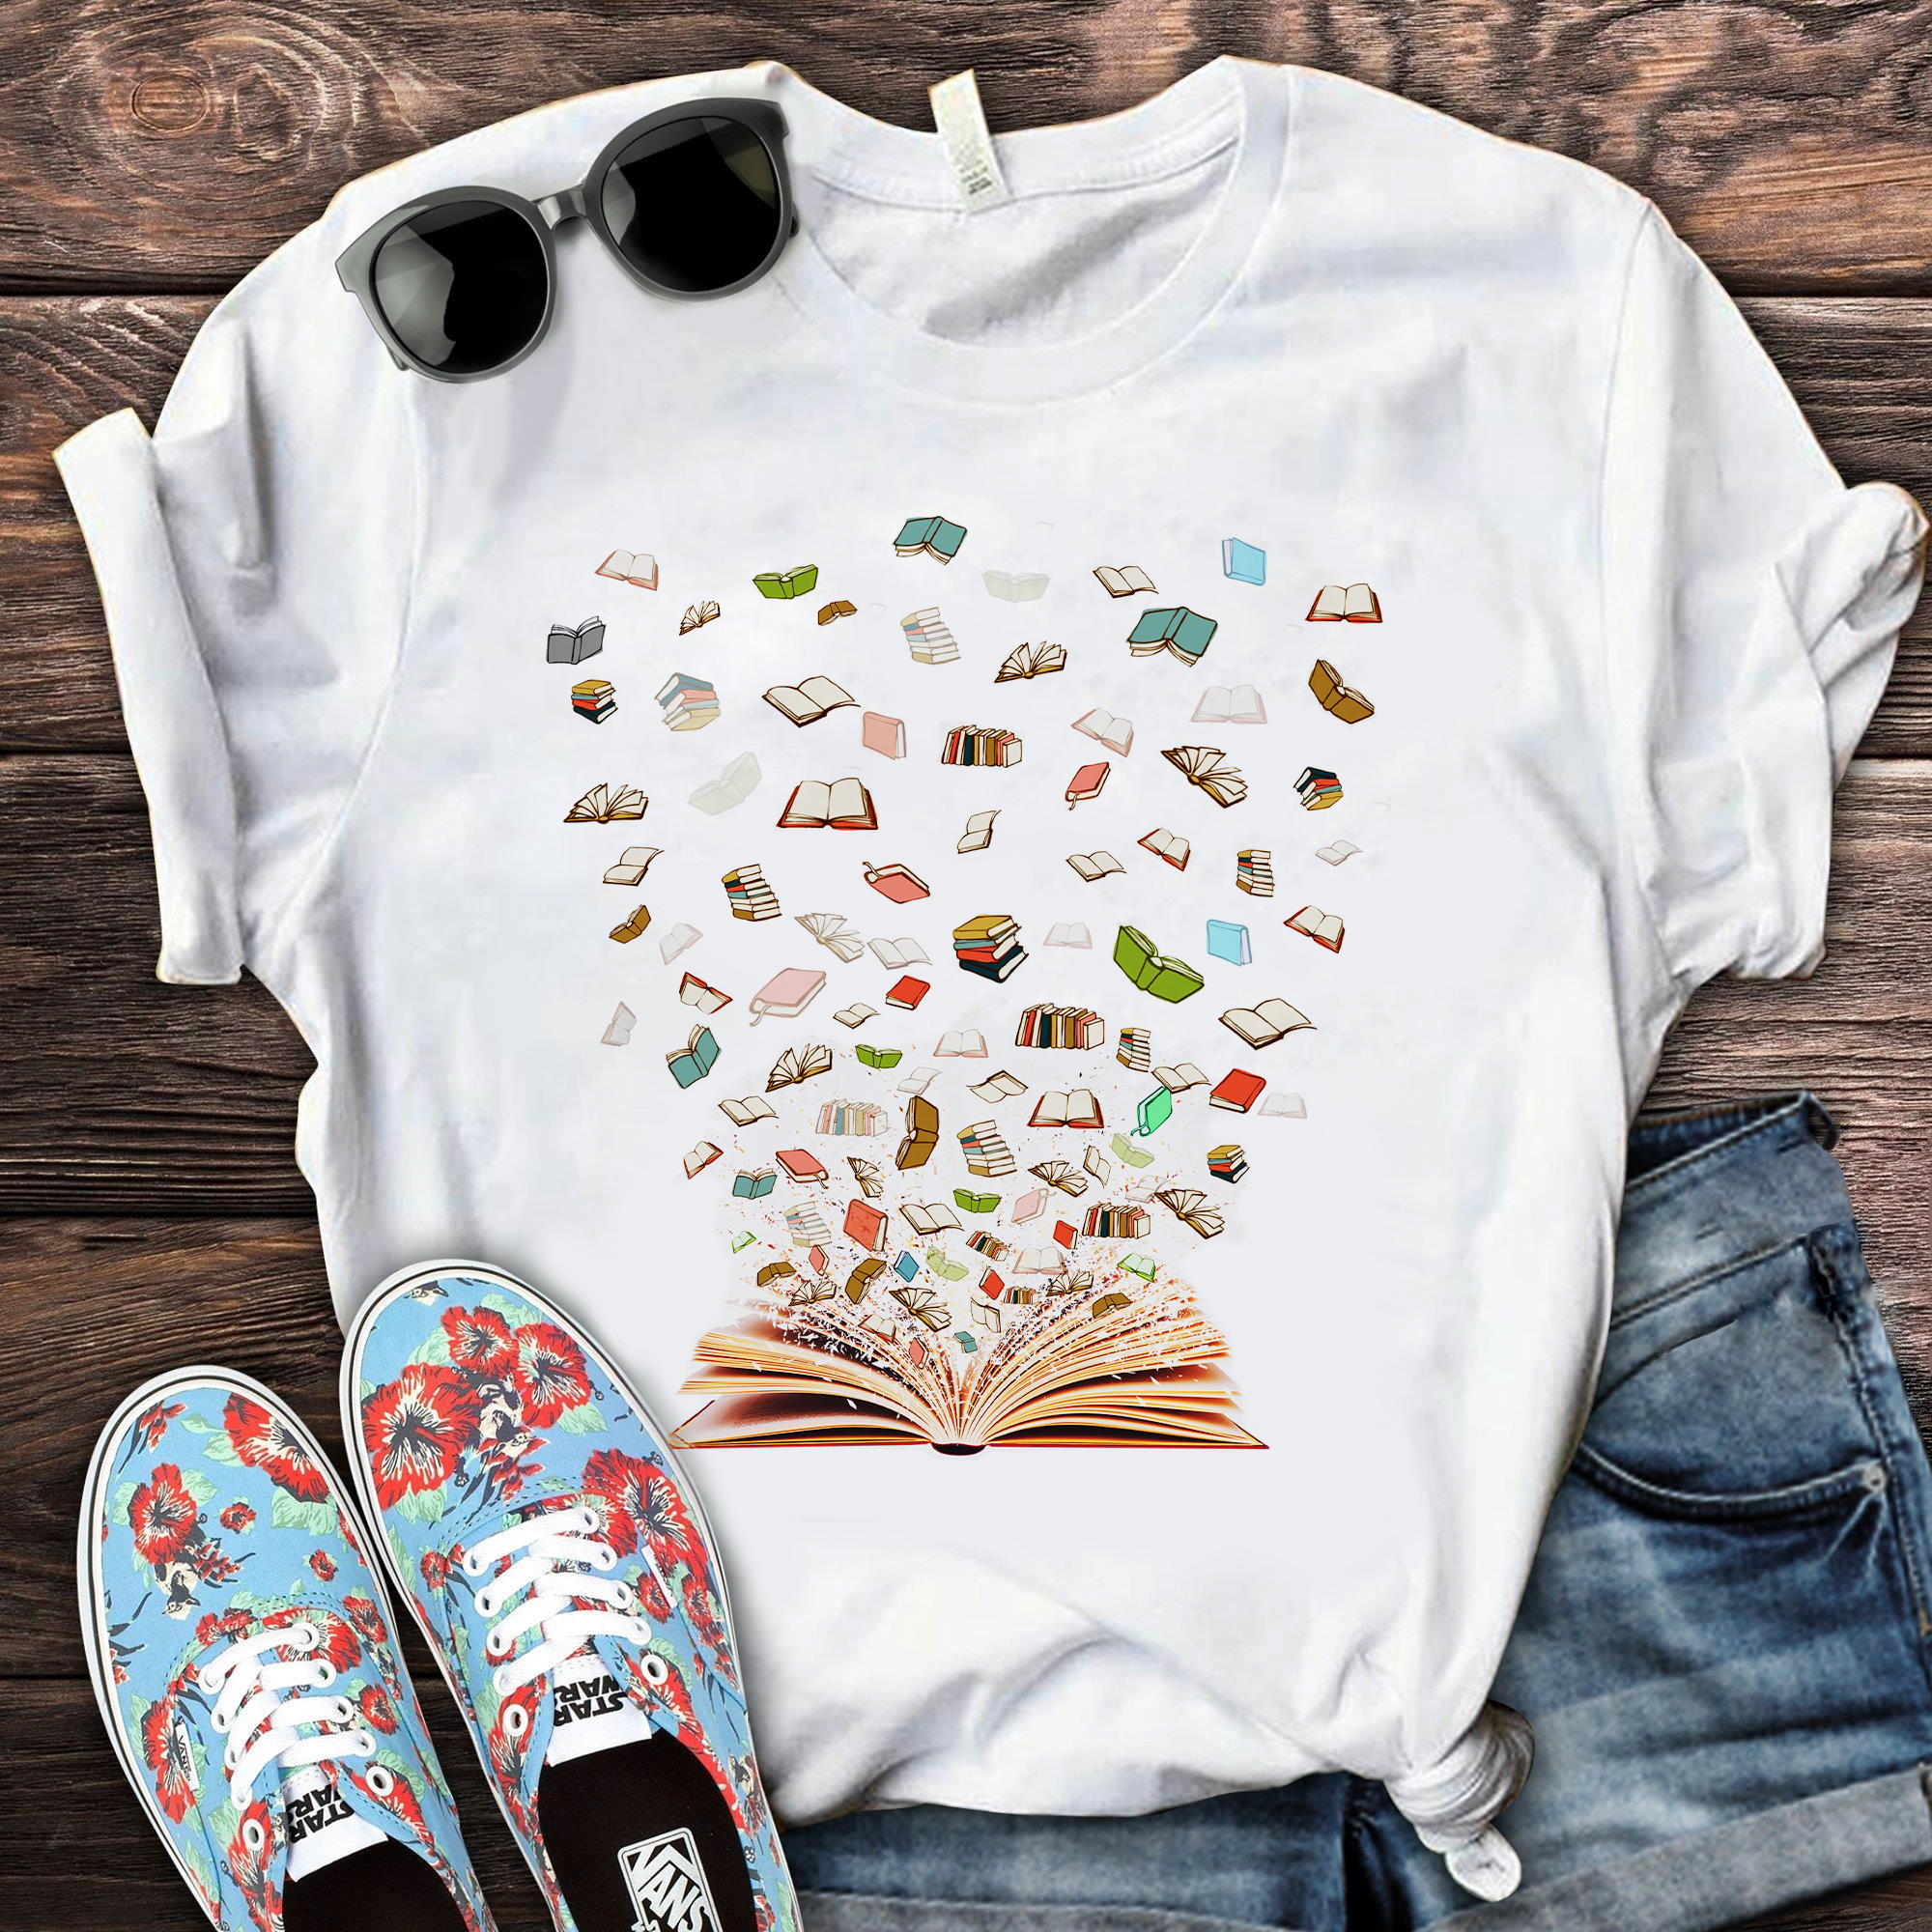 Book Shirt Open Flying Books